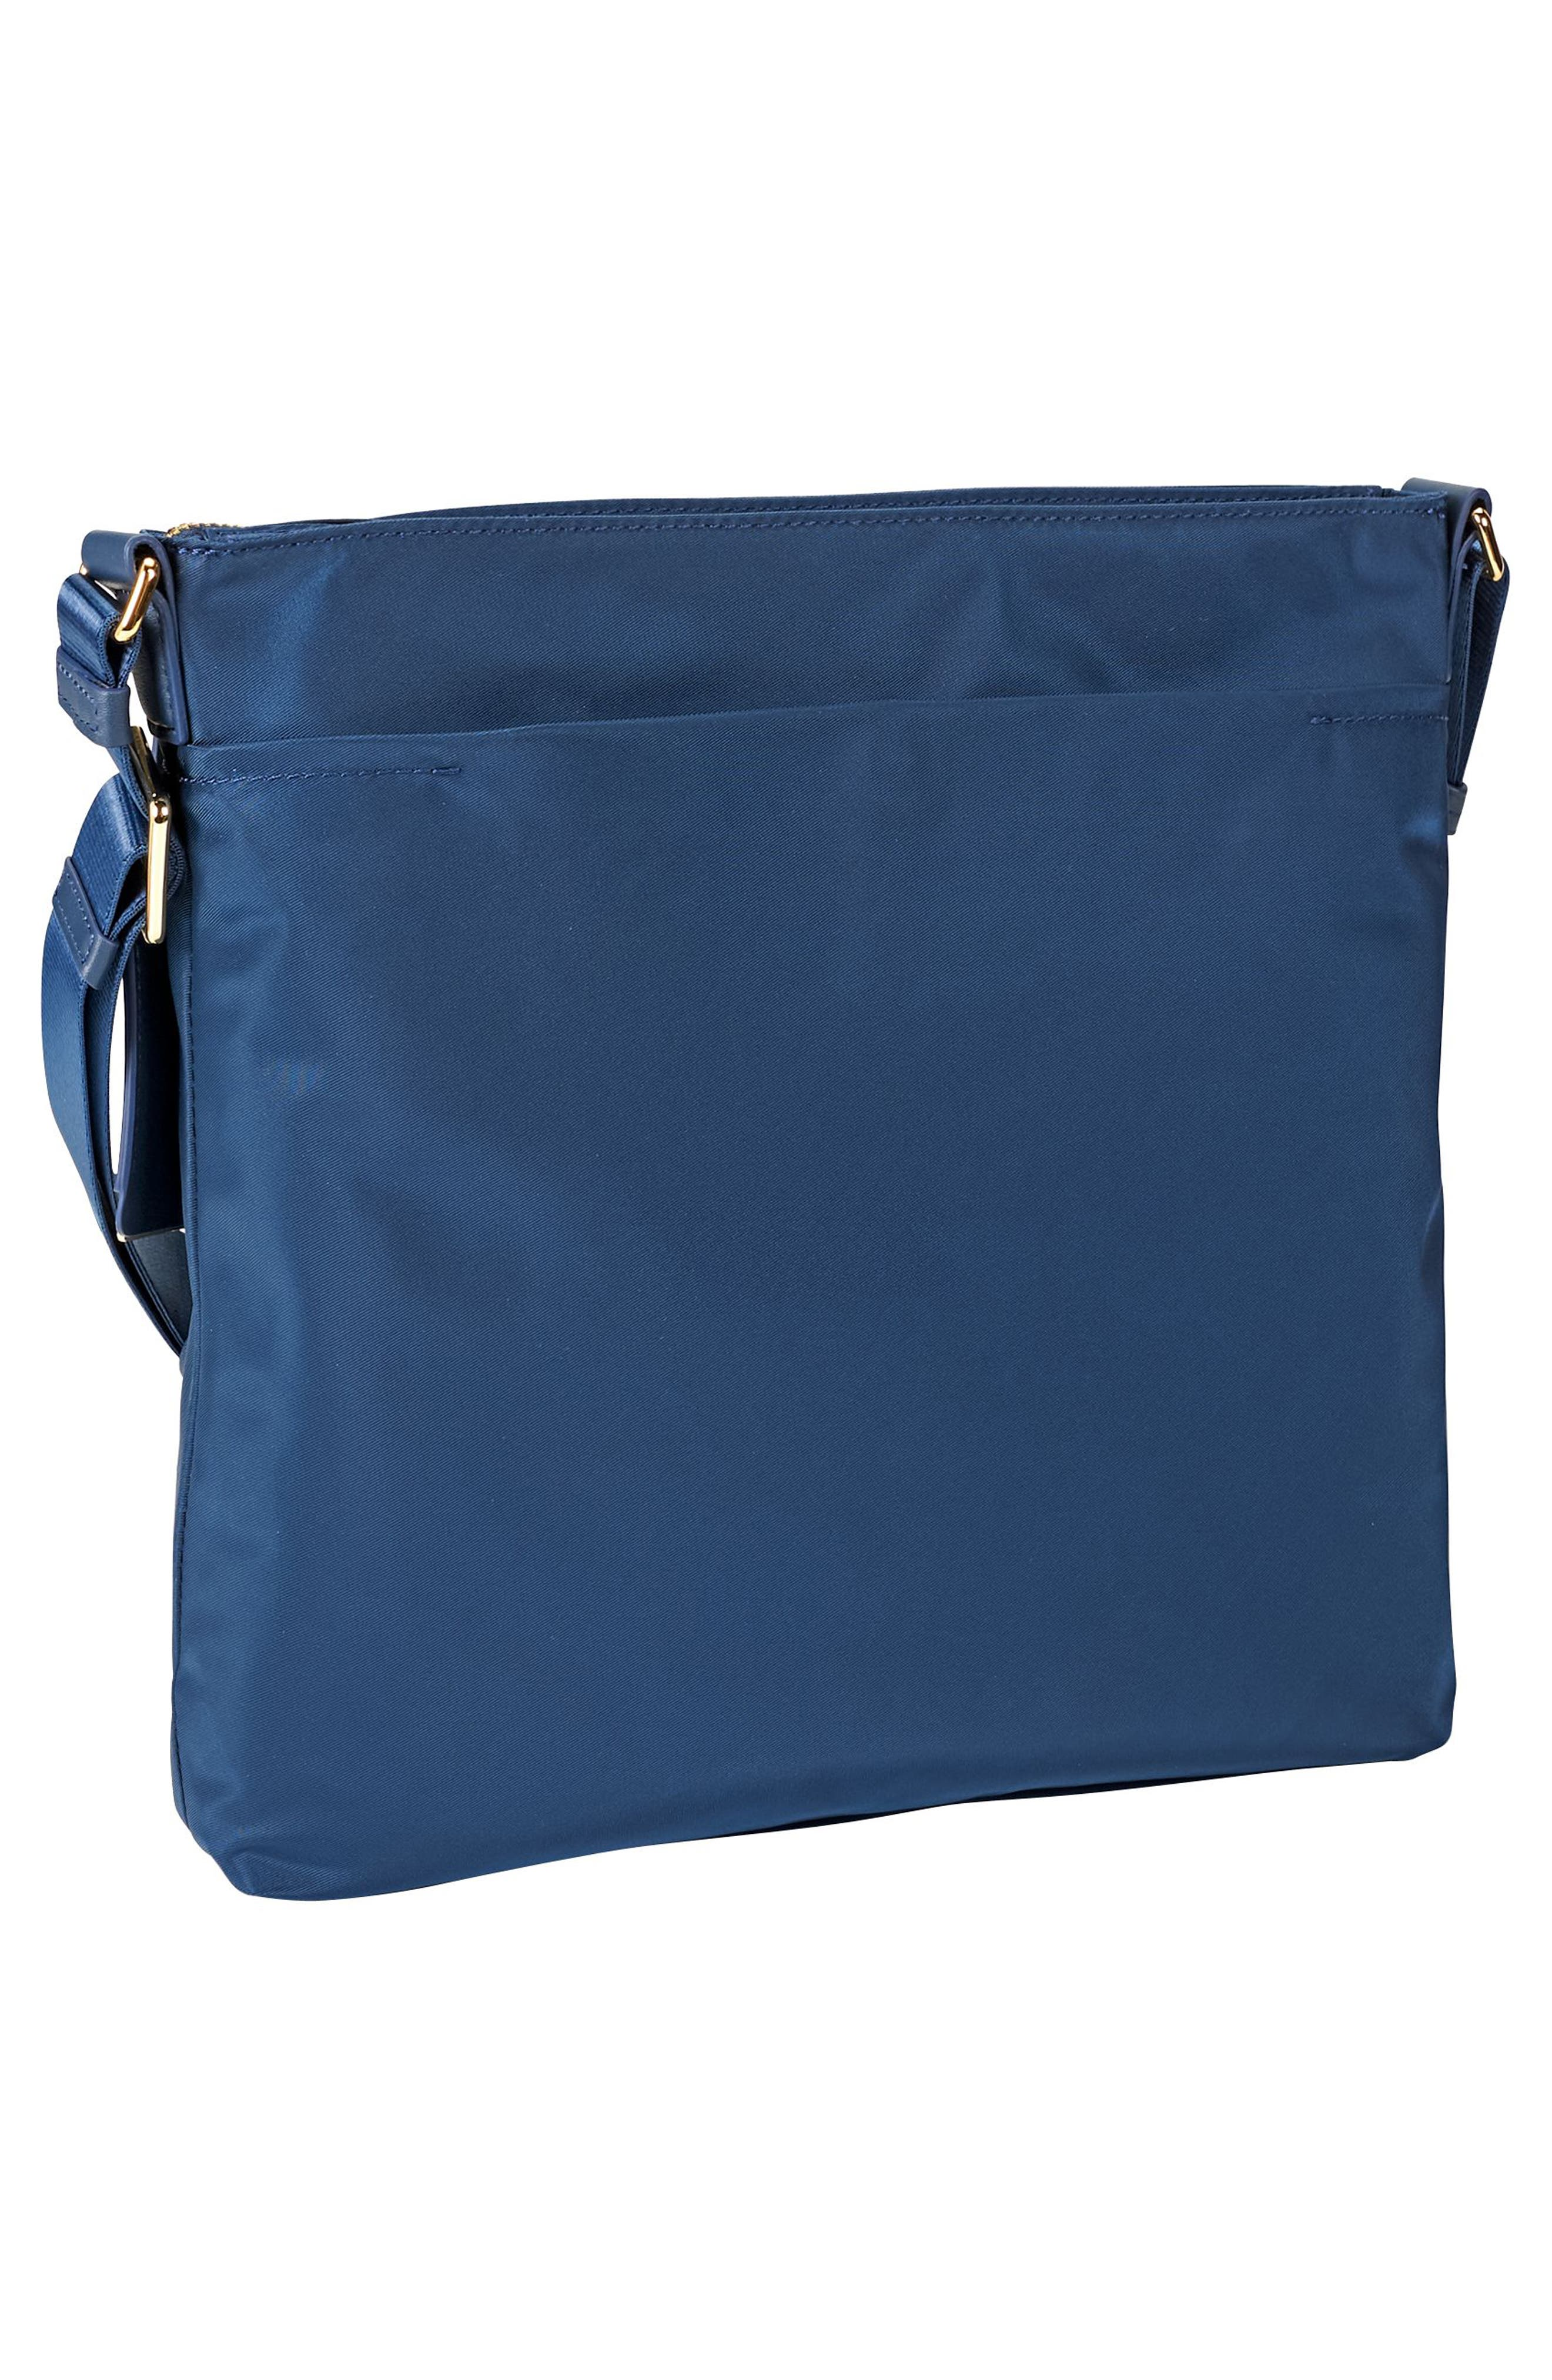 Voyageur - Capri Nylon Crossbody Bag,                             Alternate thumbnail 19, color,